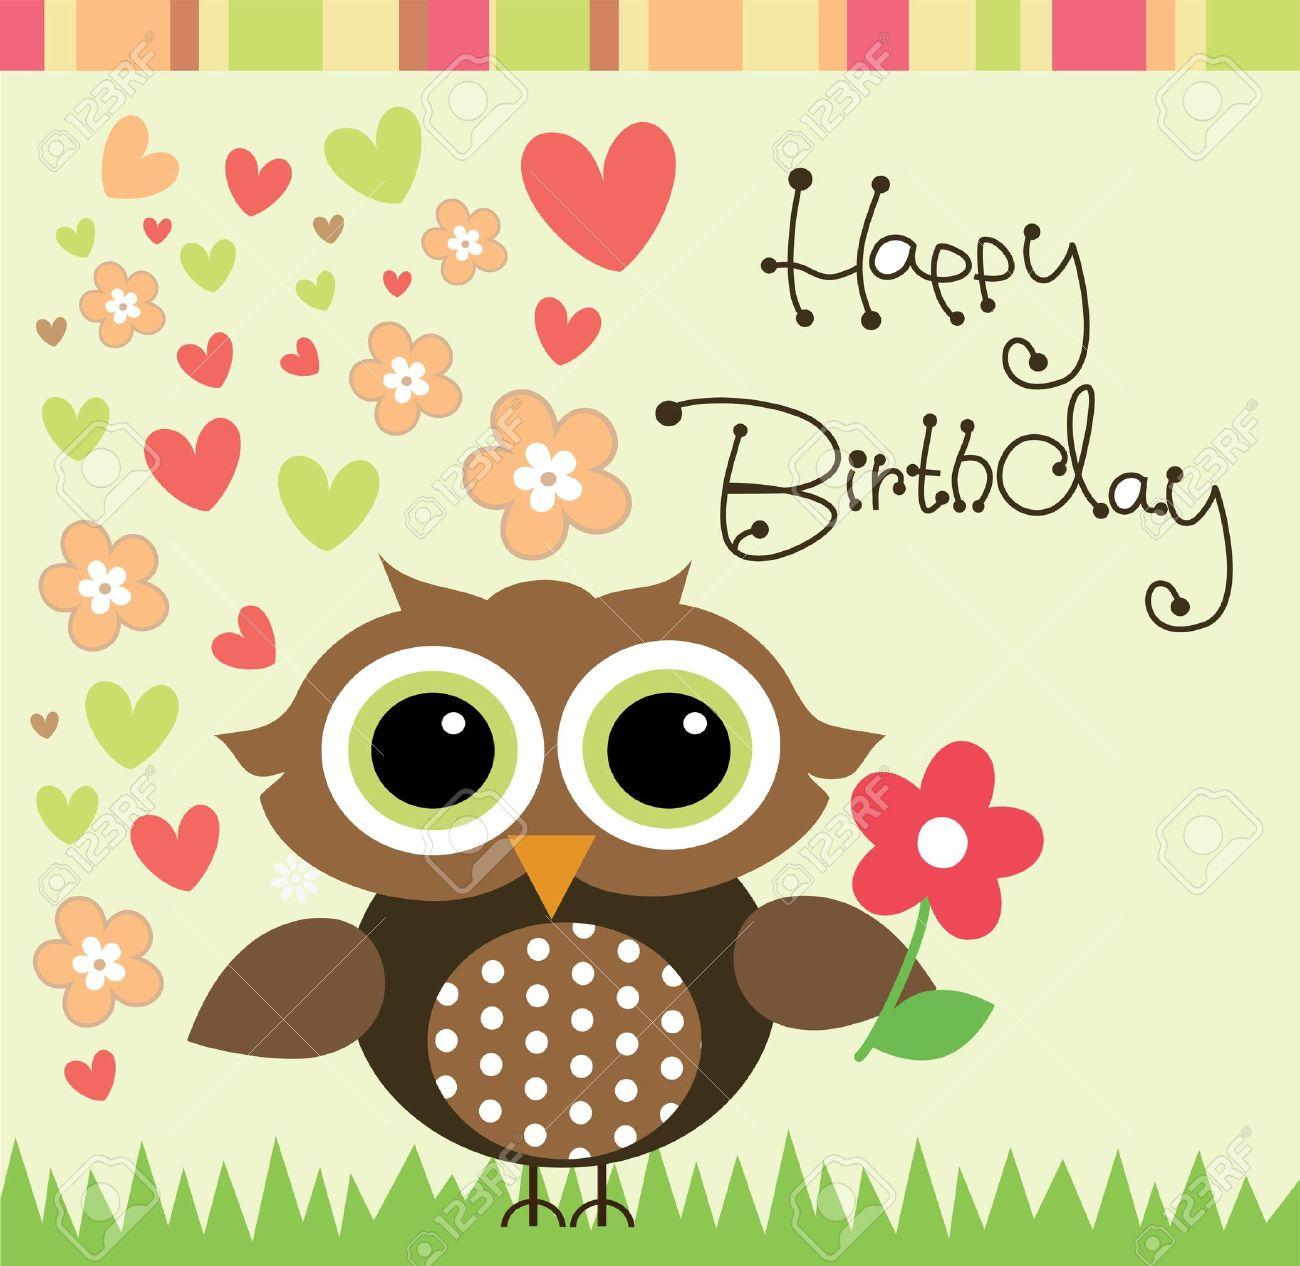 Cute Happy Birthday Ecards cool online birthday cards – Happy Birthday Card Cute